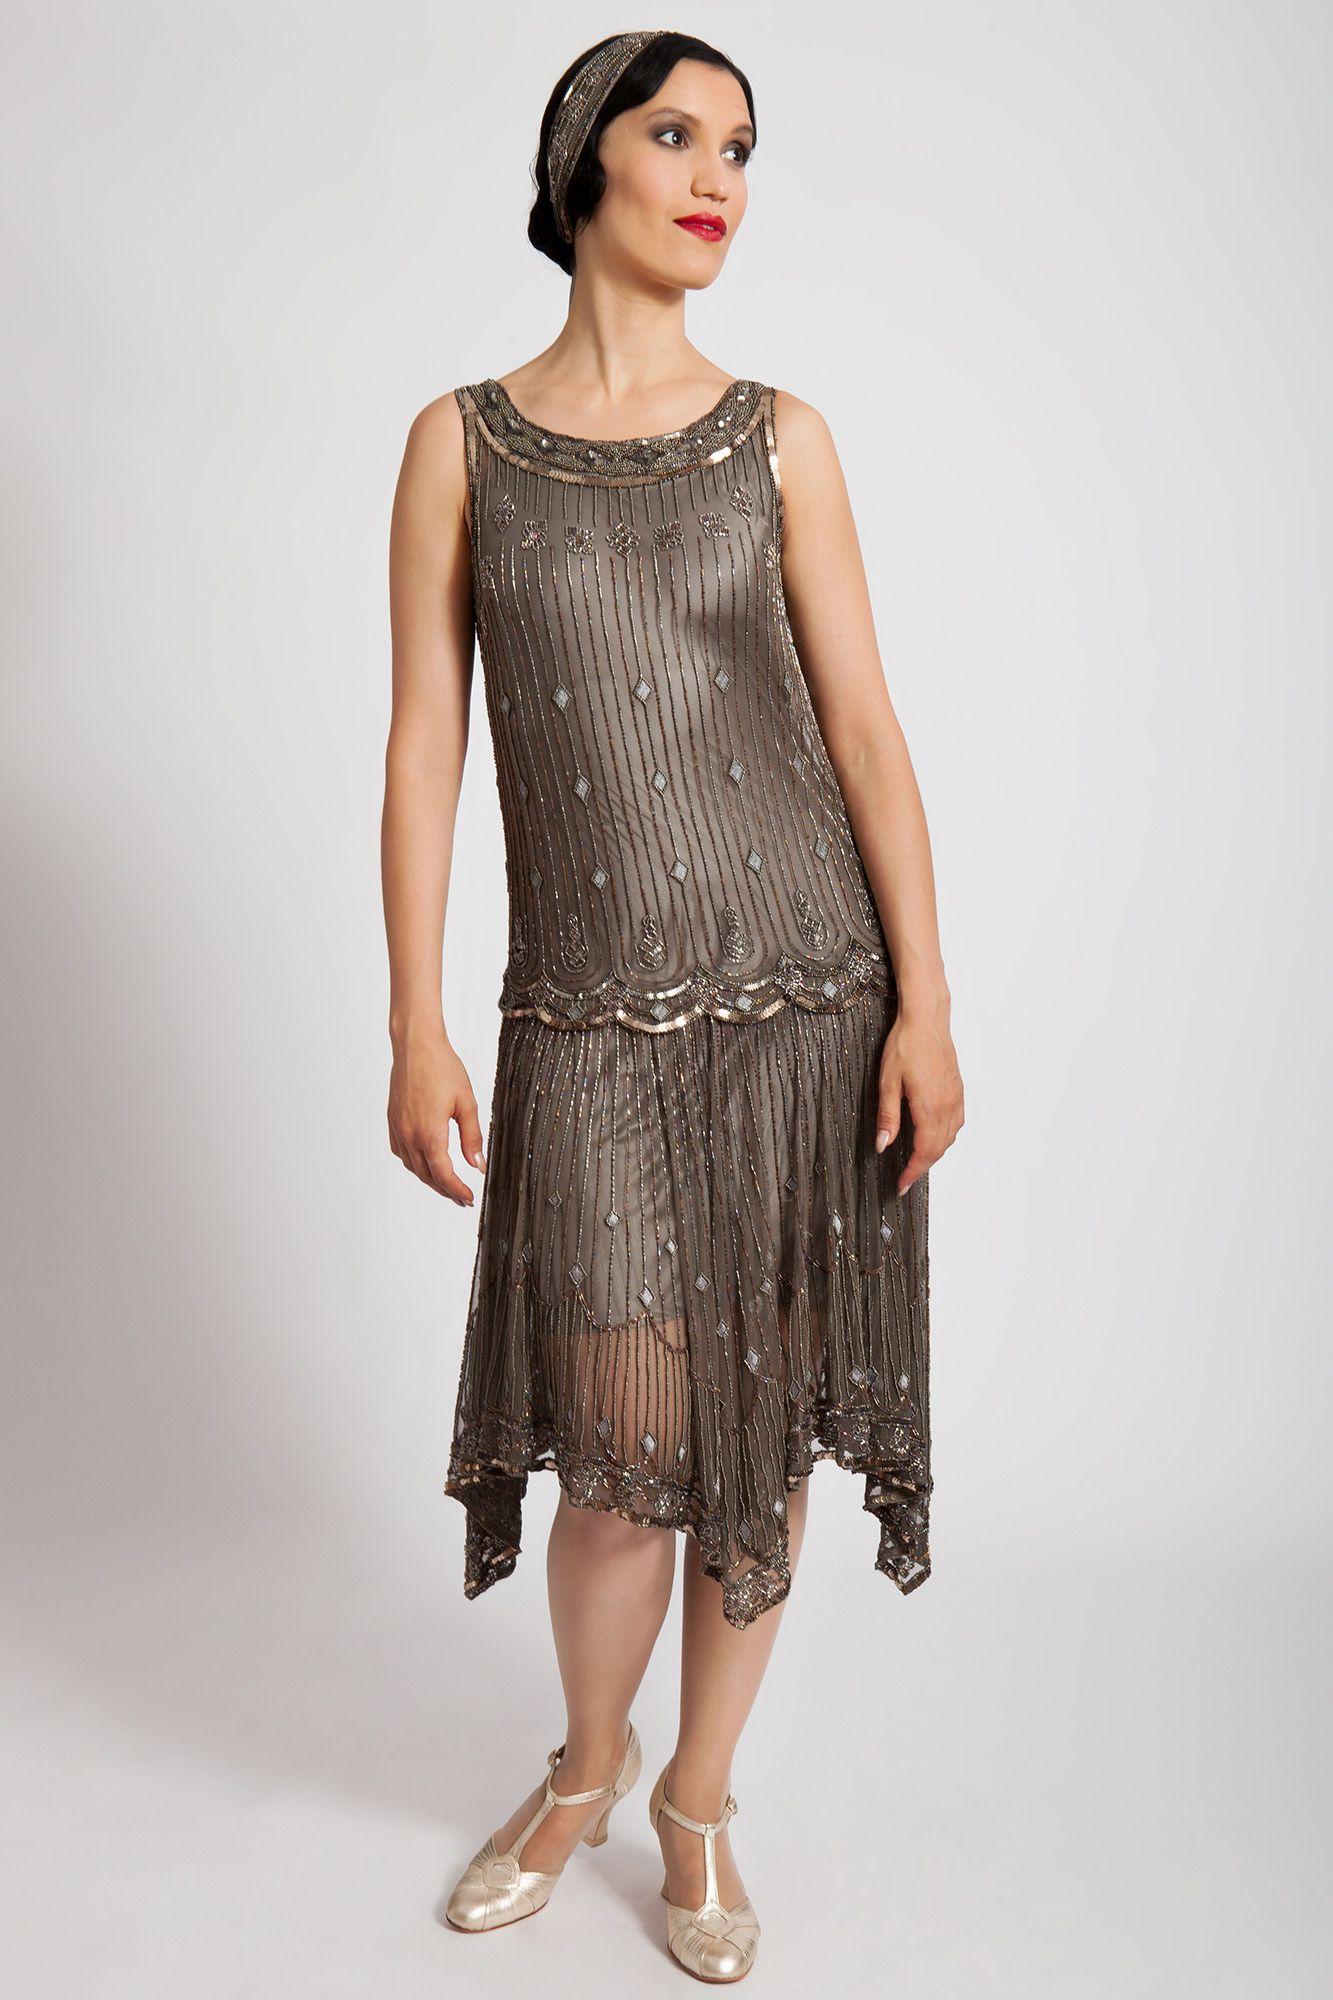 1920\'s Style Dresses: Flapper Dresses to Gatsby dresses